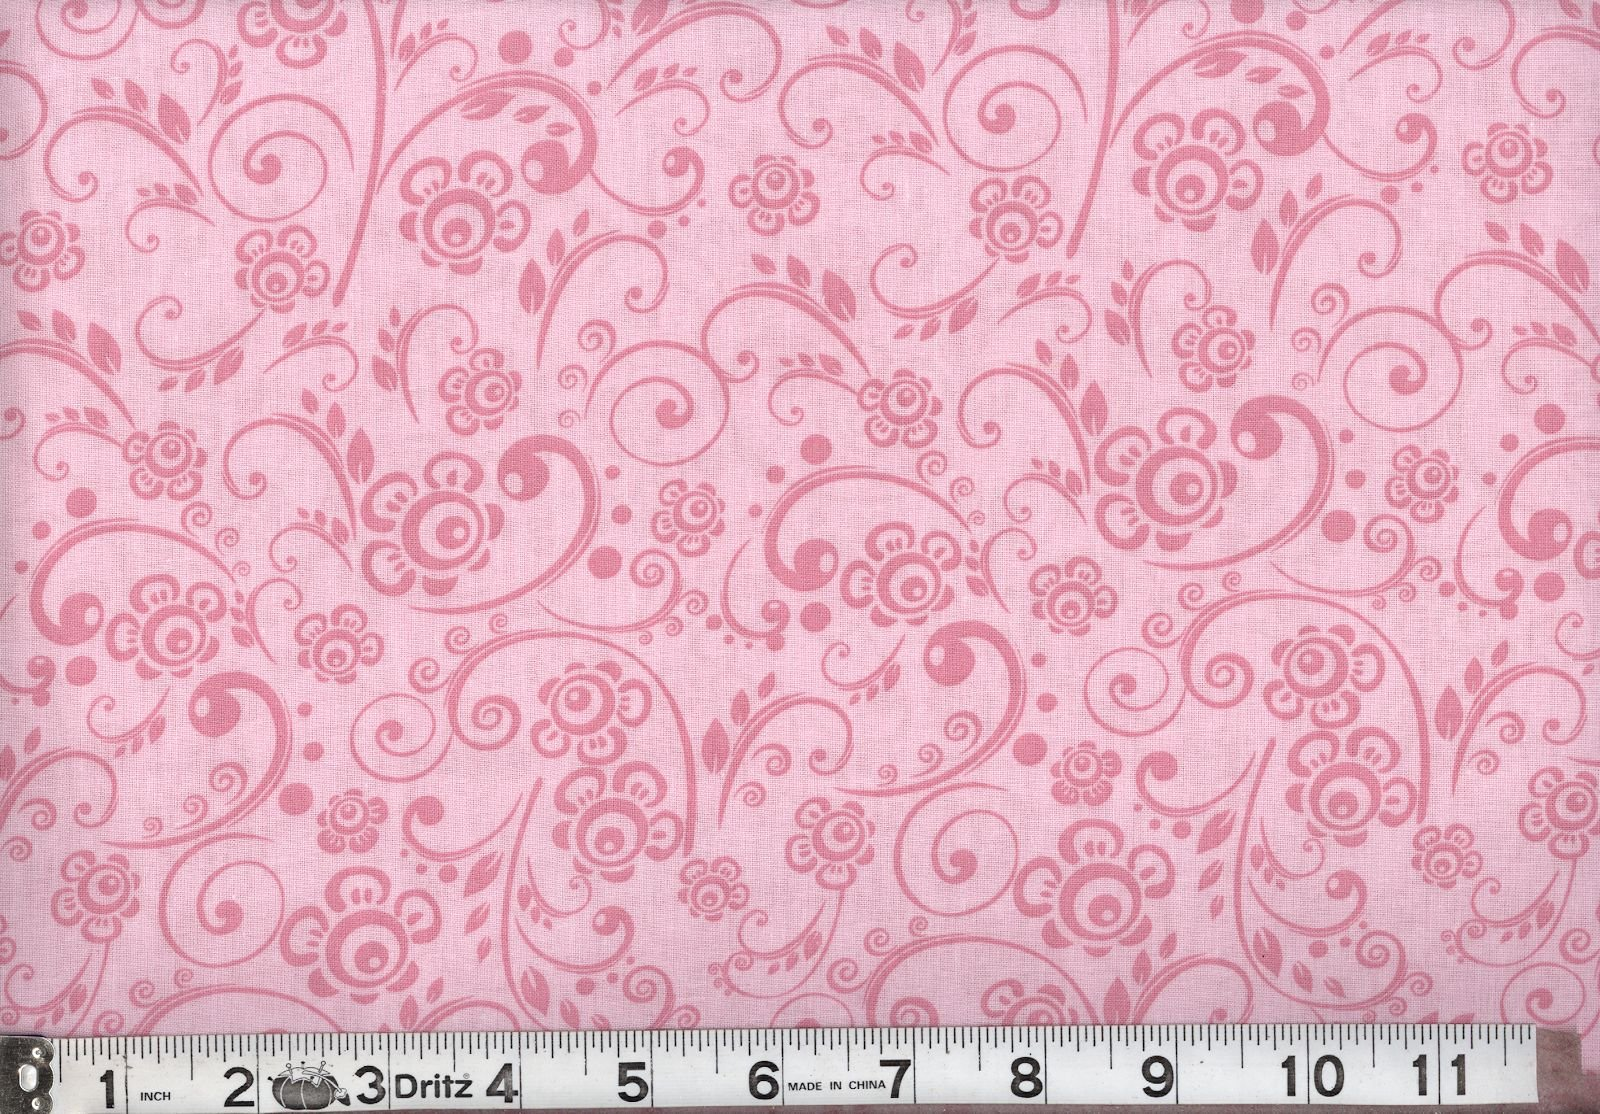 108 Overtone Prints Pink - 3 yard cut